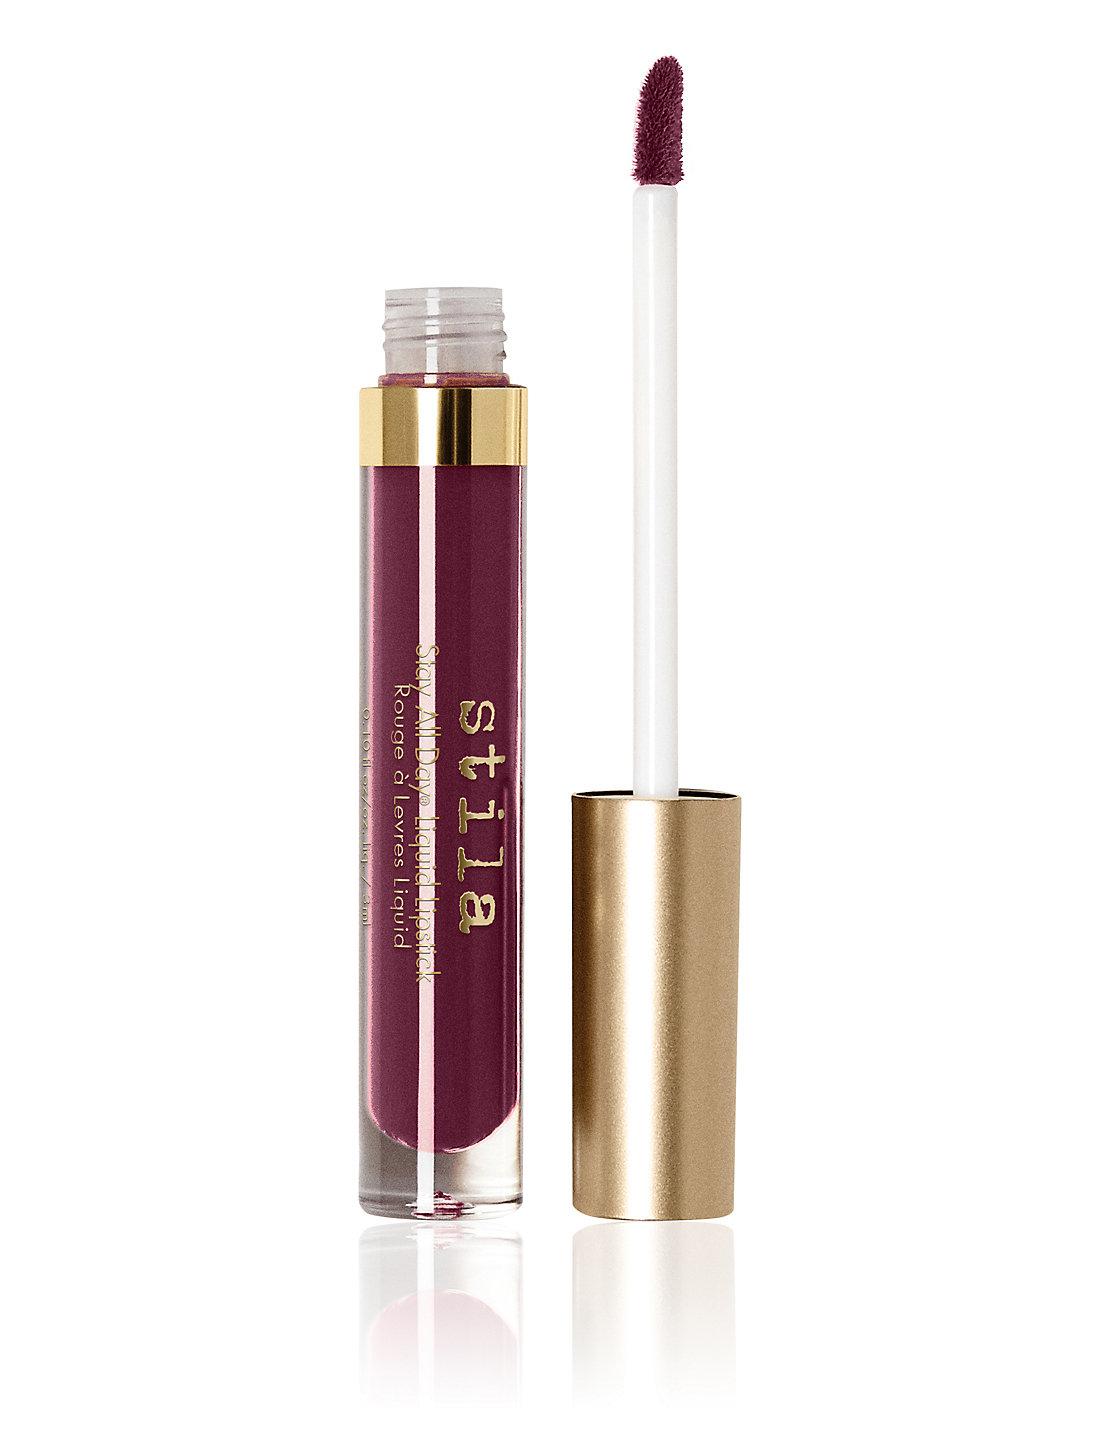 Lipsticks Lip Gloss & Liner Matte & Nude Lipstick